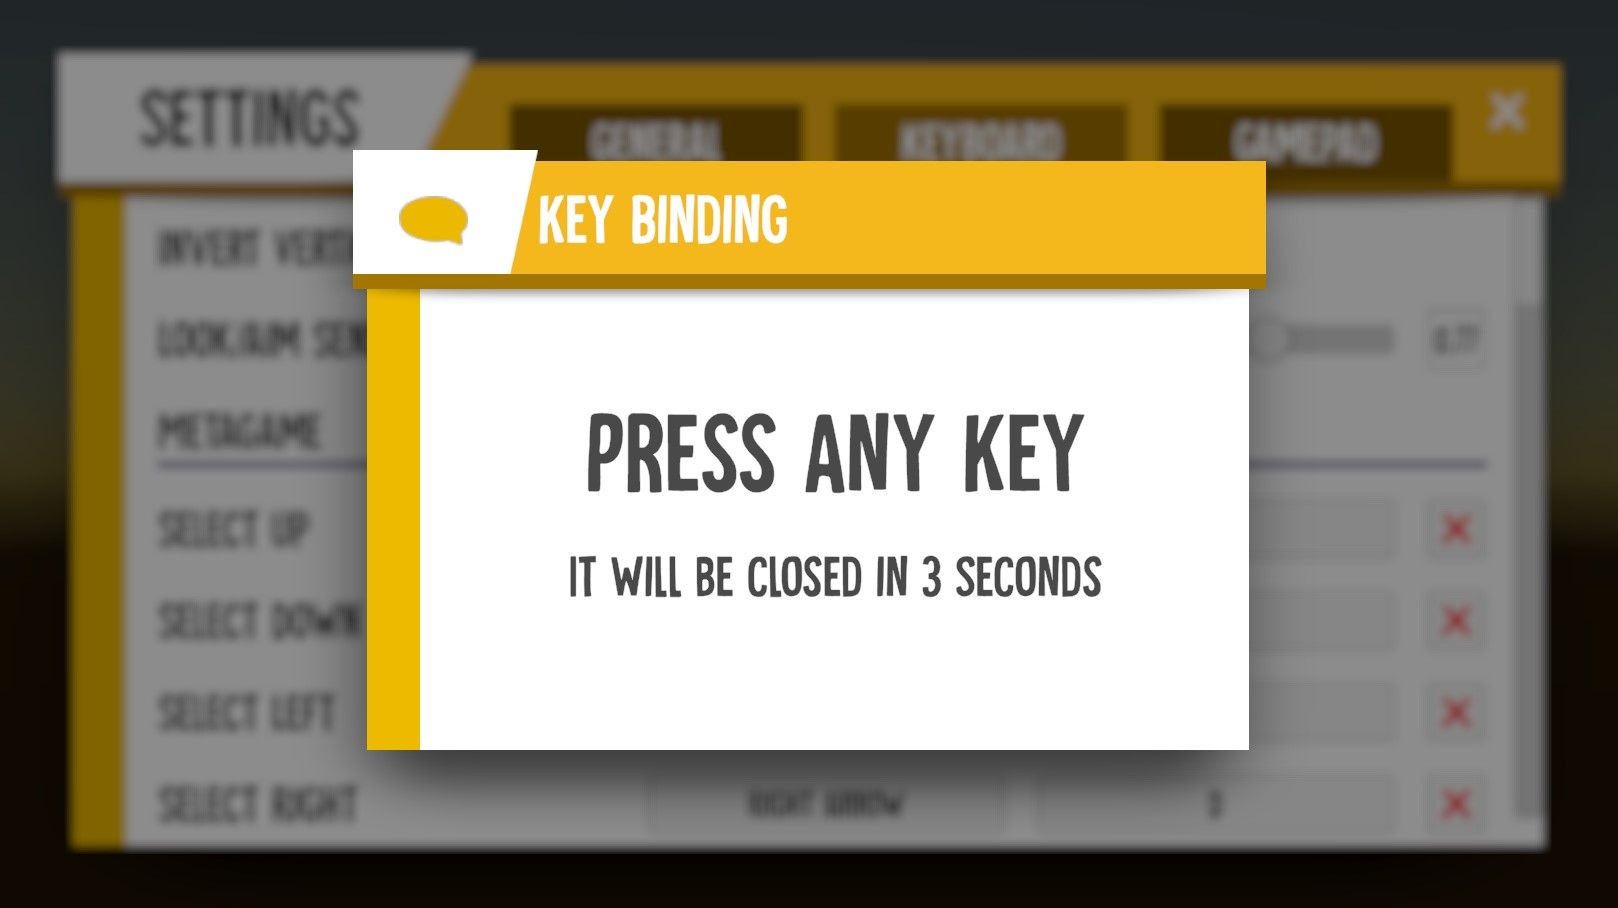 LIGHT⚡NITE – Settings dialog: key binding